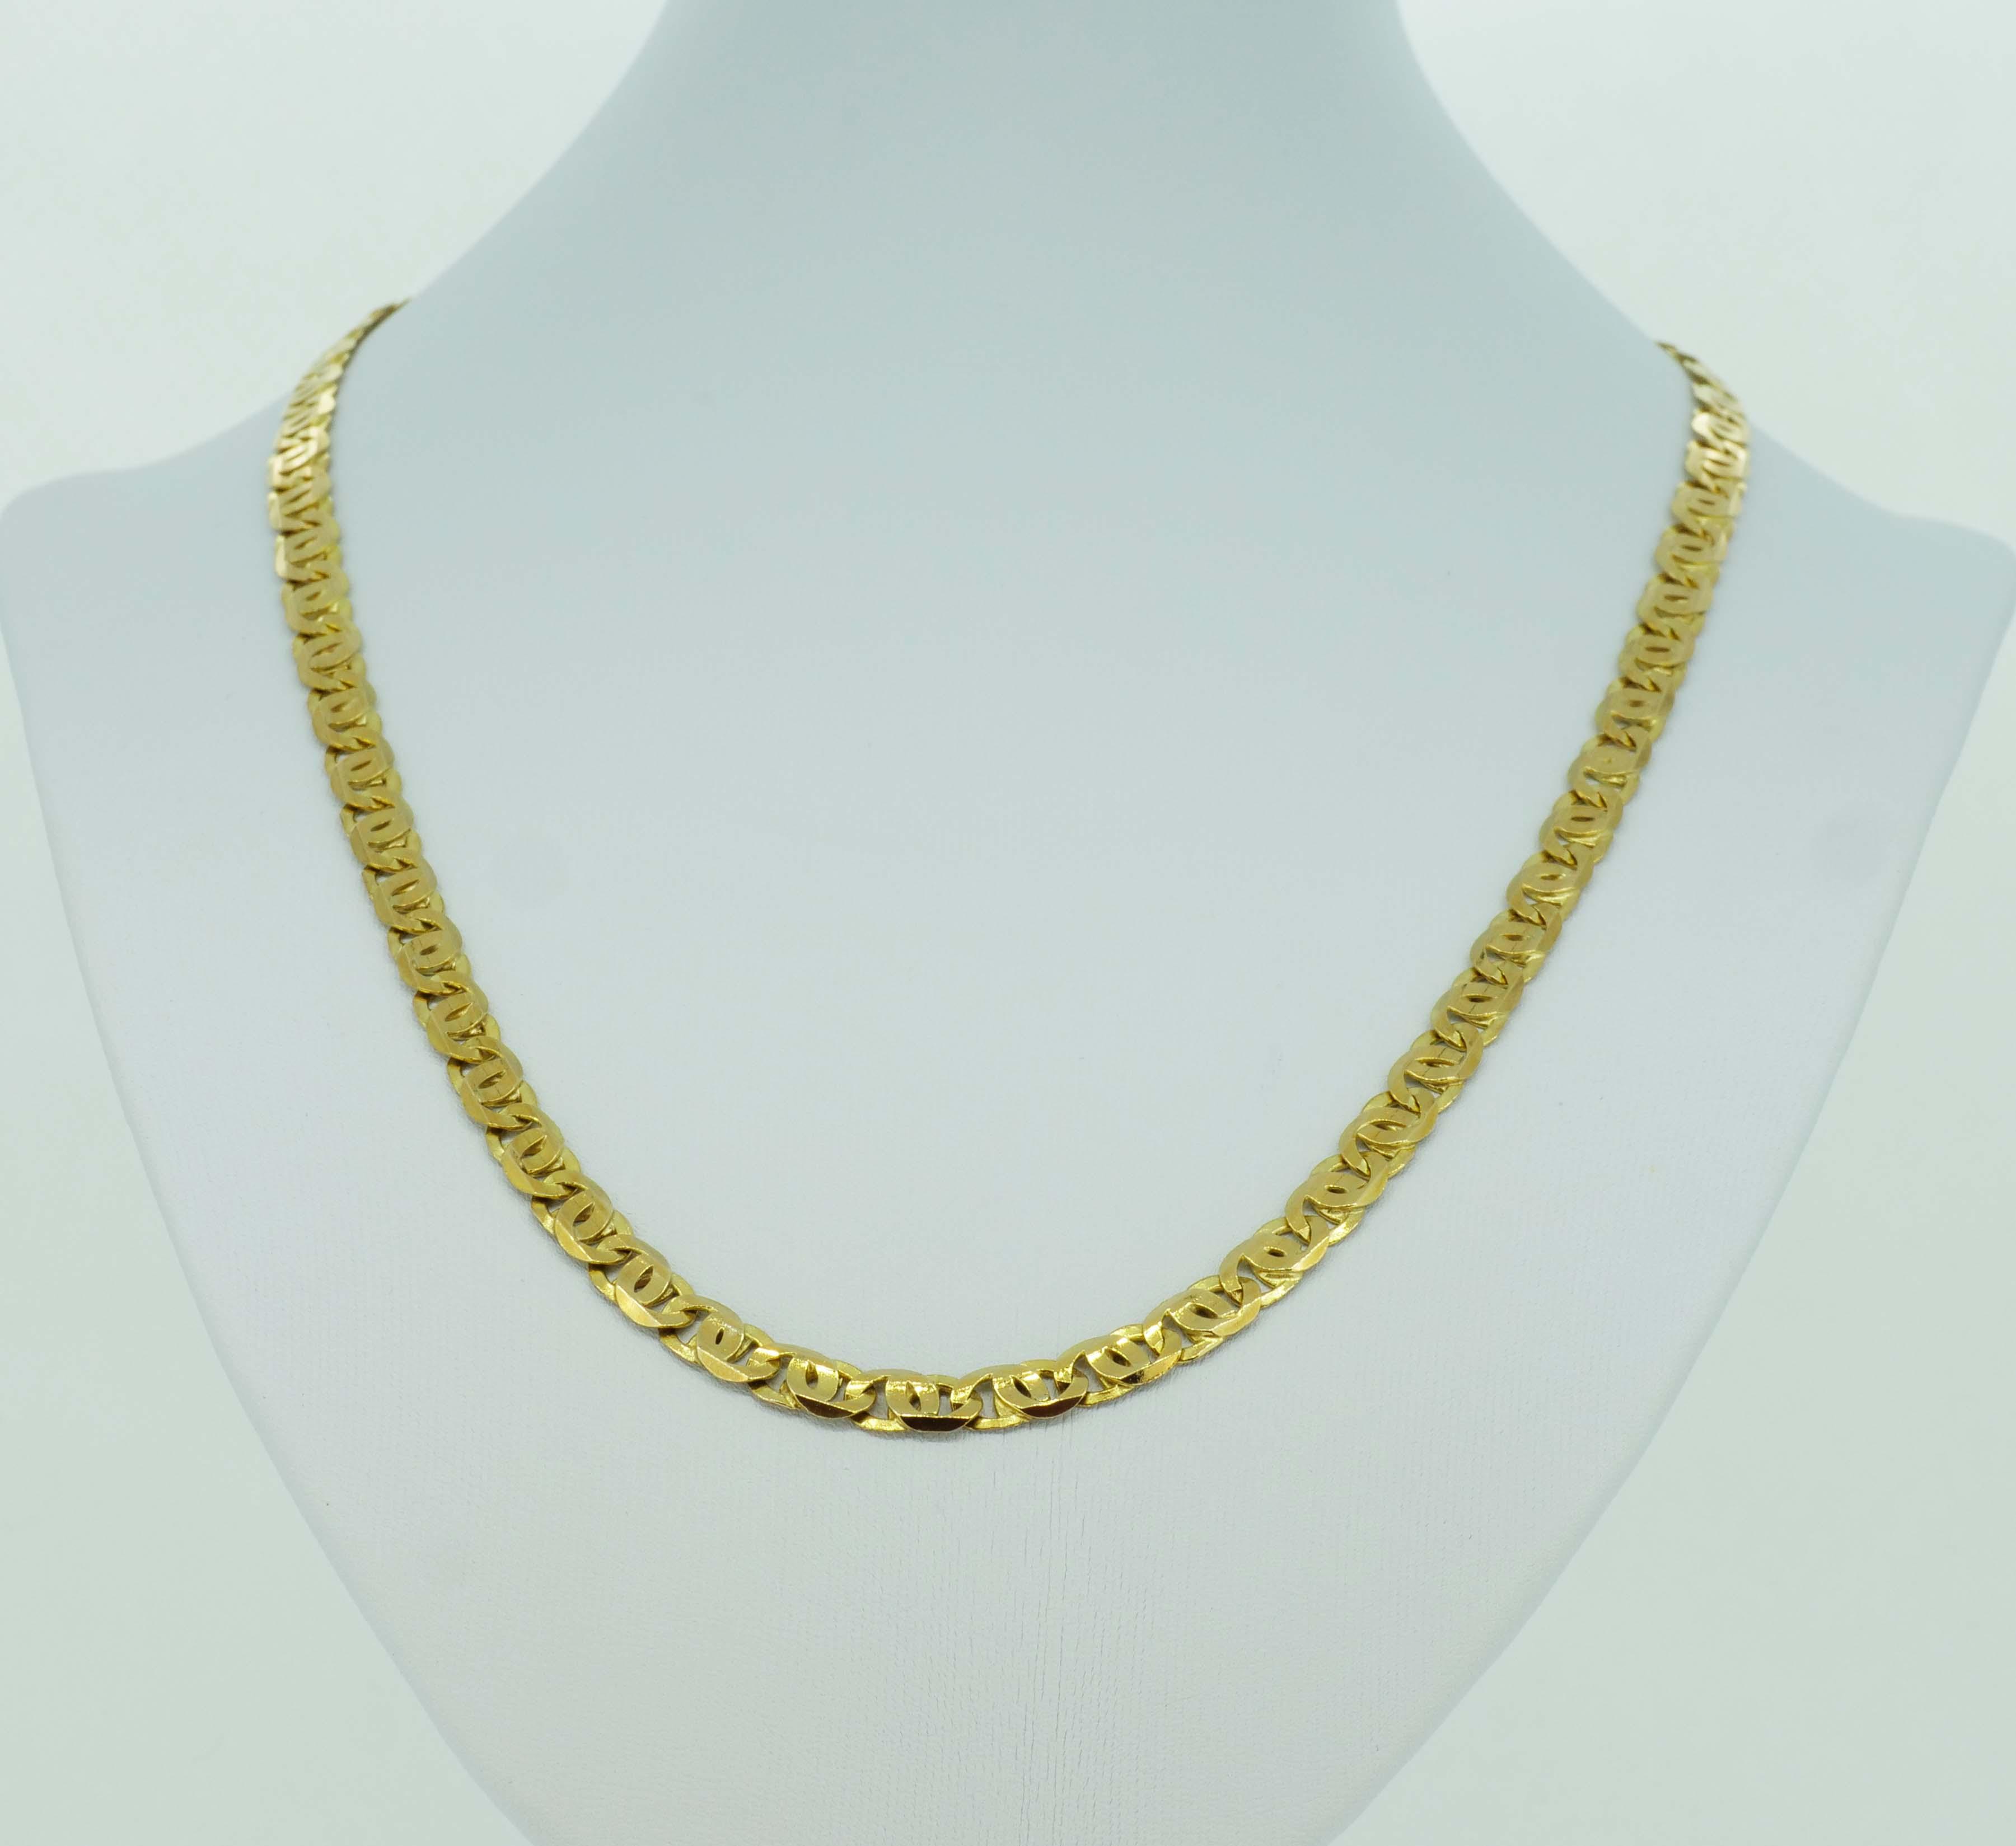 Bewährte Herrengoldkette